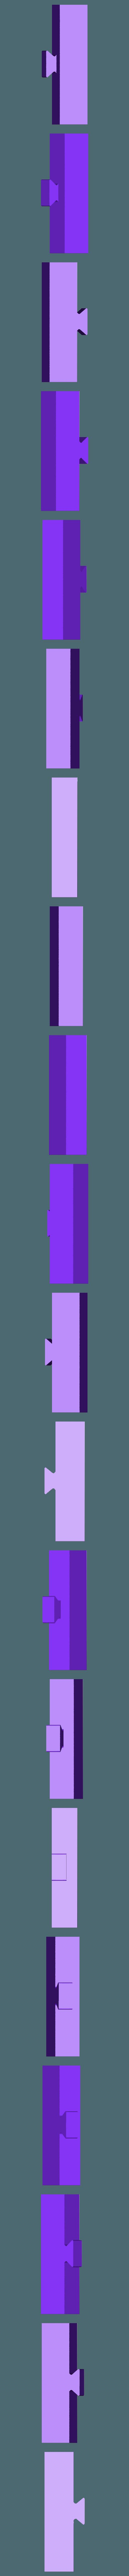 25mm_Stripper_Clip_1x_v5_M-End.stl Download free STL file 25mm Base Slide Tray Scale-able • 3D printable object, aLazyCamper